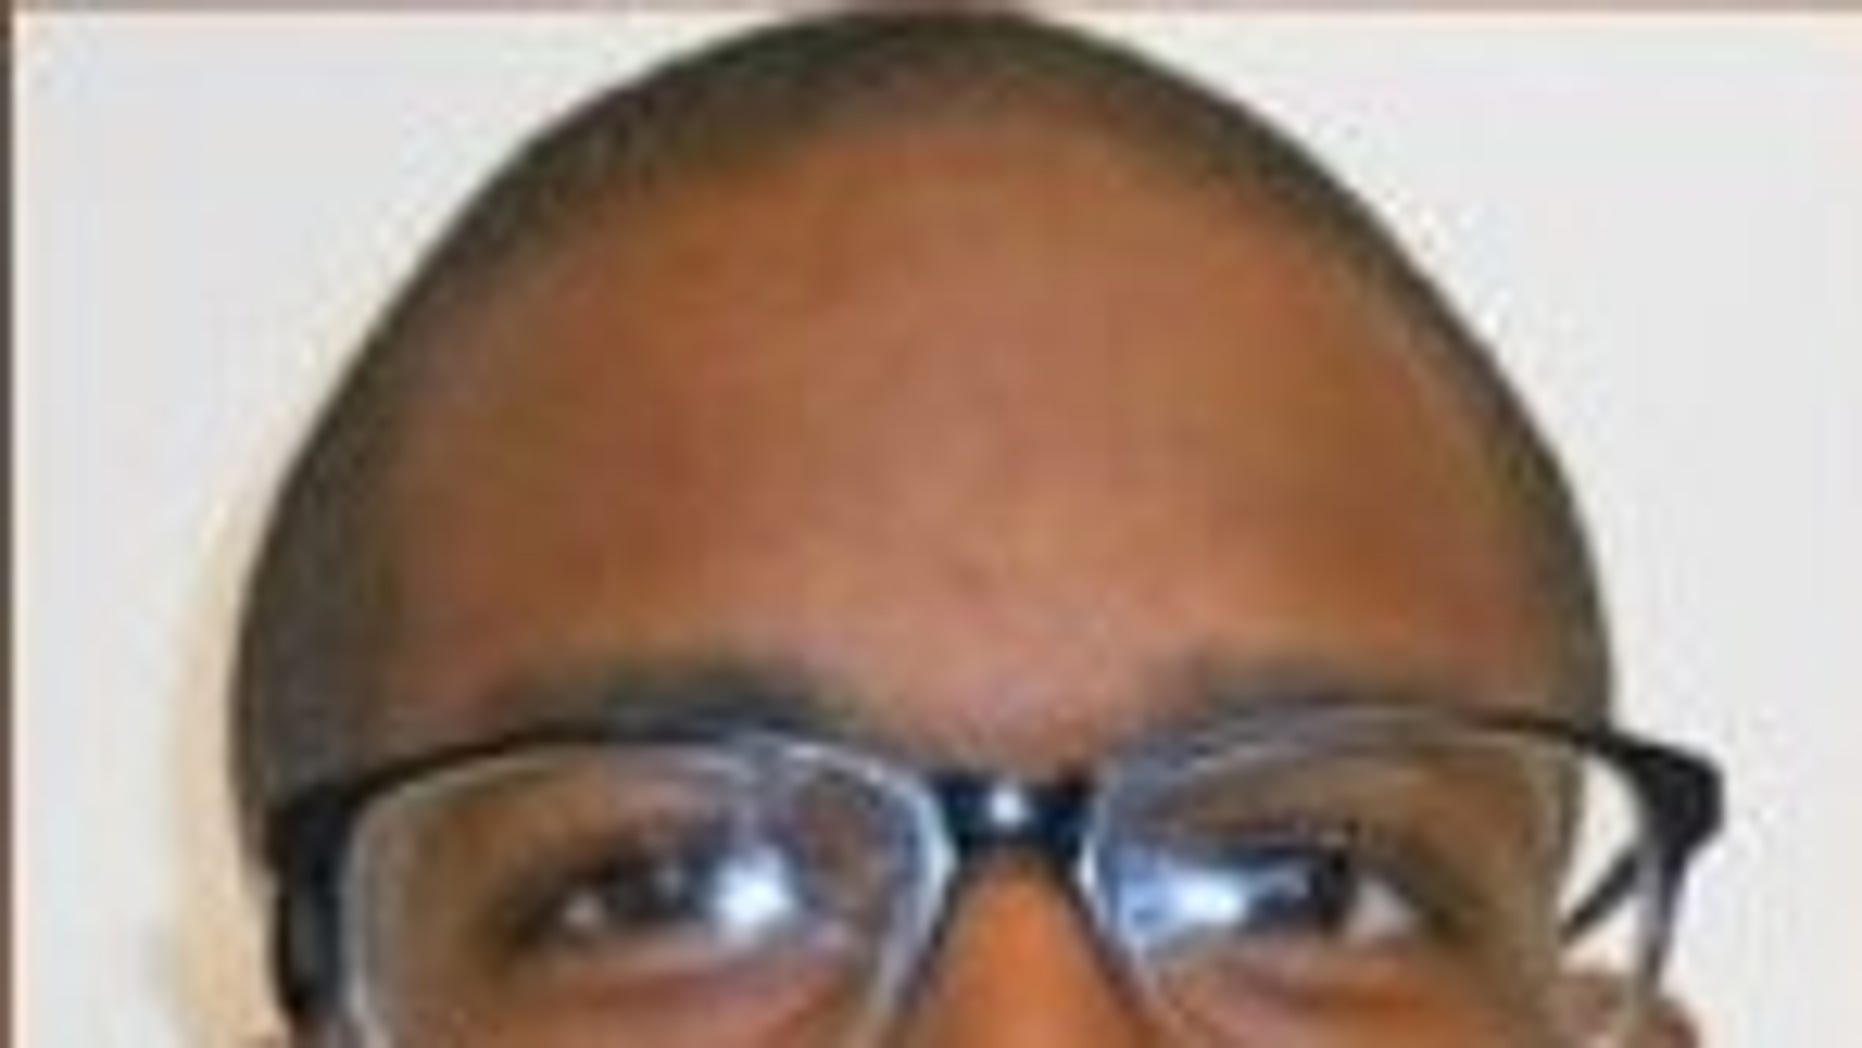 Ladarius Blue, 26, was arrested Monday during the total solar eclipse, investigators said. (Iowa Sex Offender Registry)